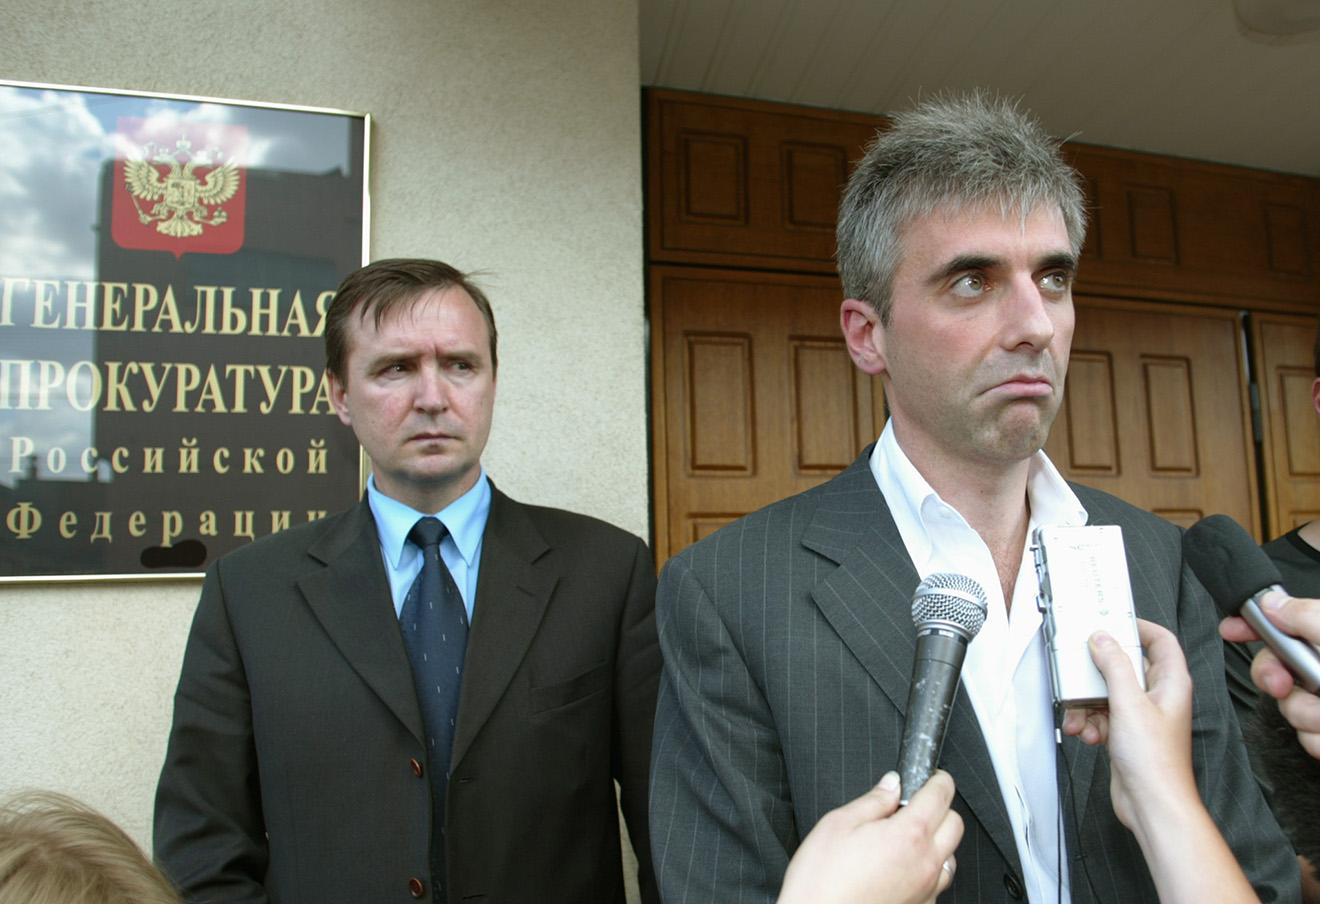 Леонид Невзлин (справа), 2003 год.